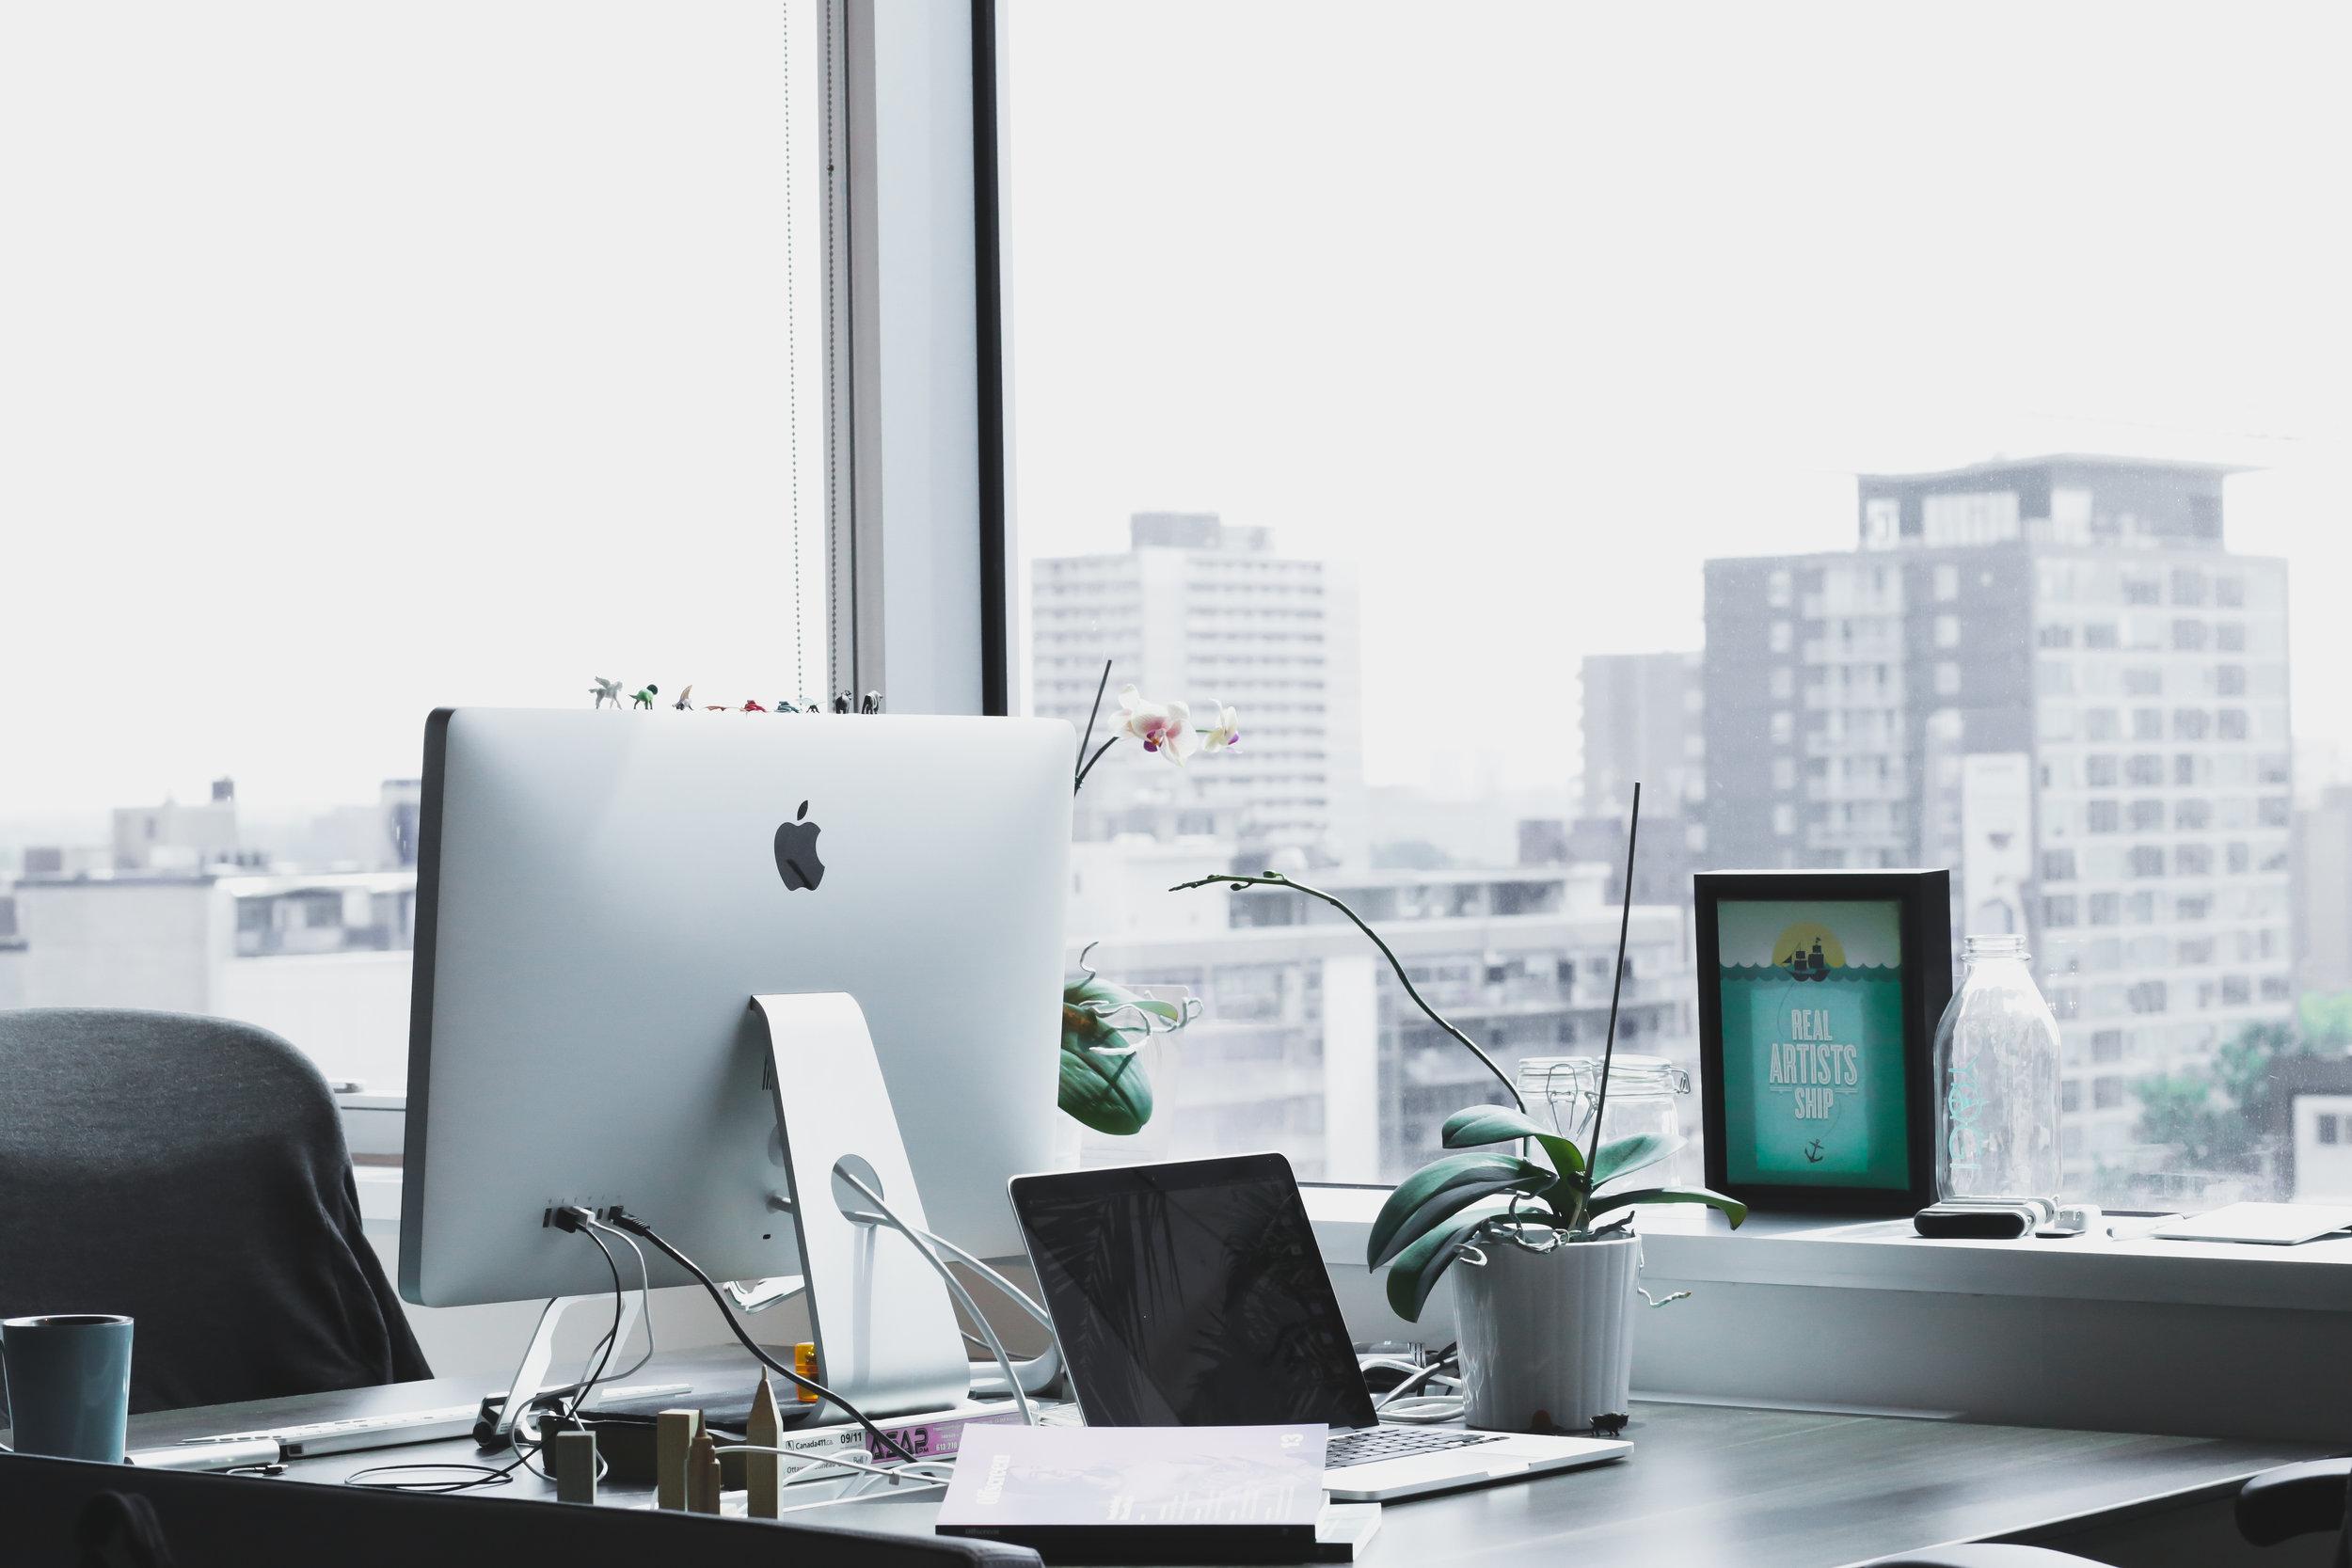 APRIL 2019 - Office Culture